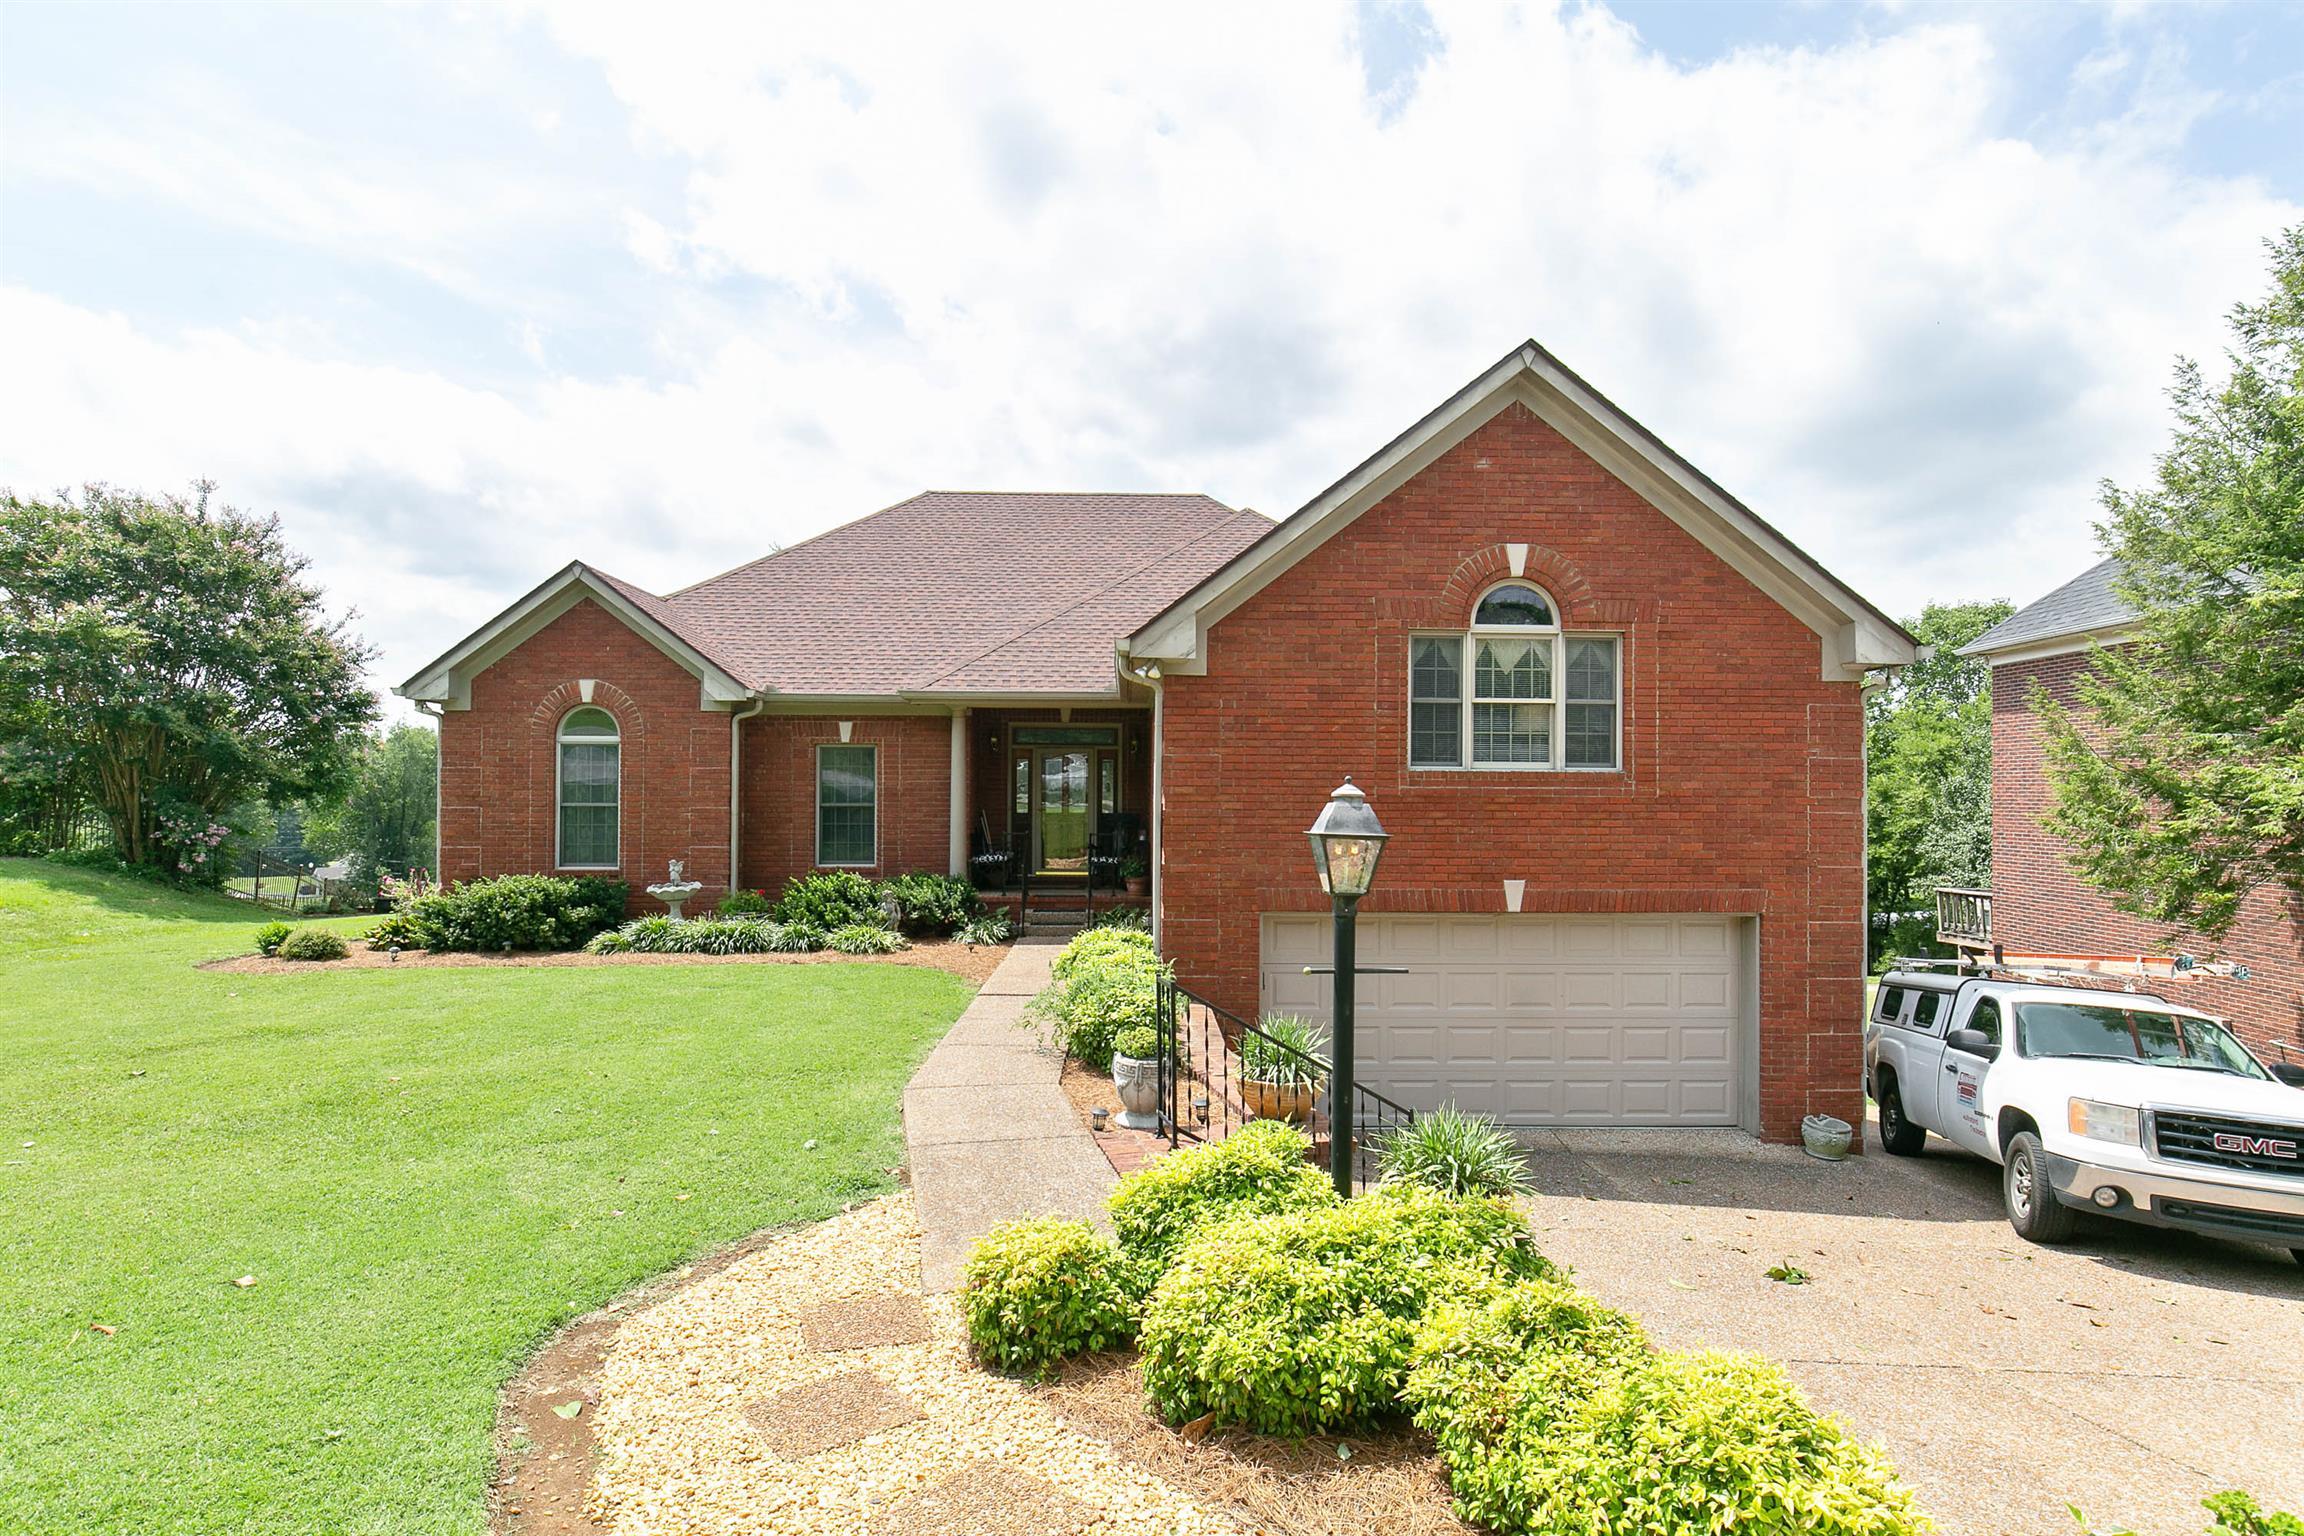 108 Echo Hill Blvd, Goodlettsville, TN 37072 - Goodlettsville, TN real estate listing